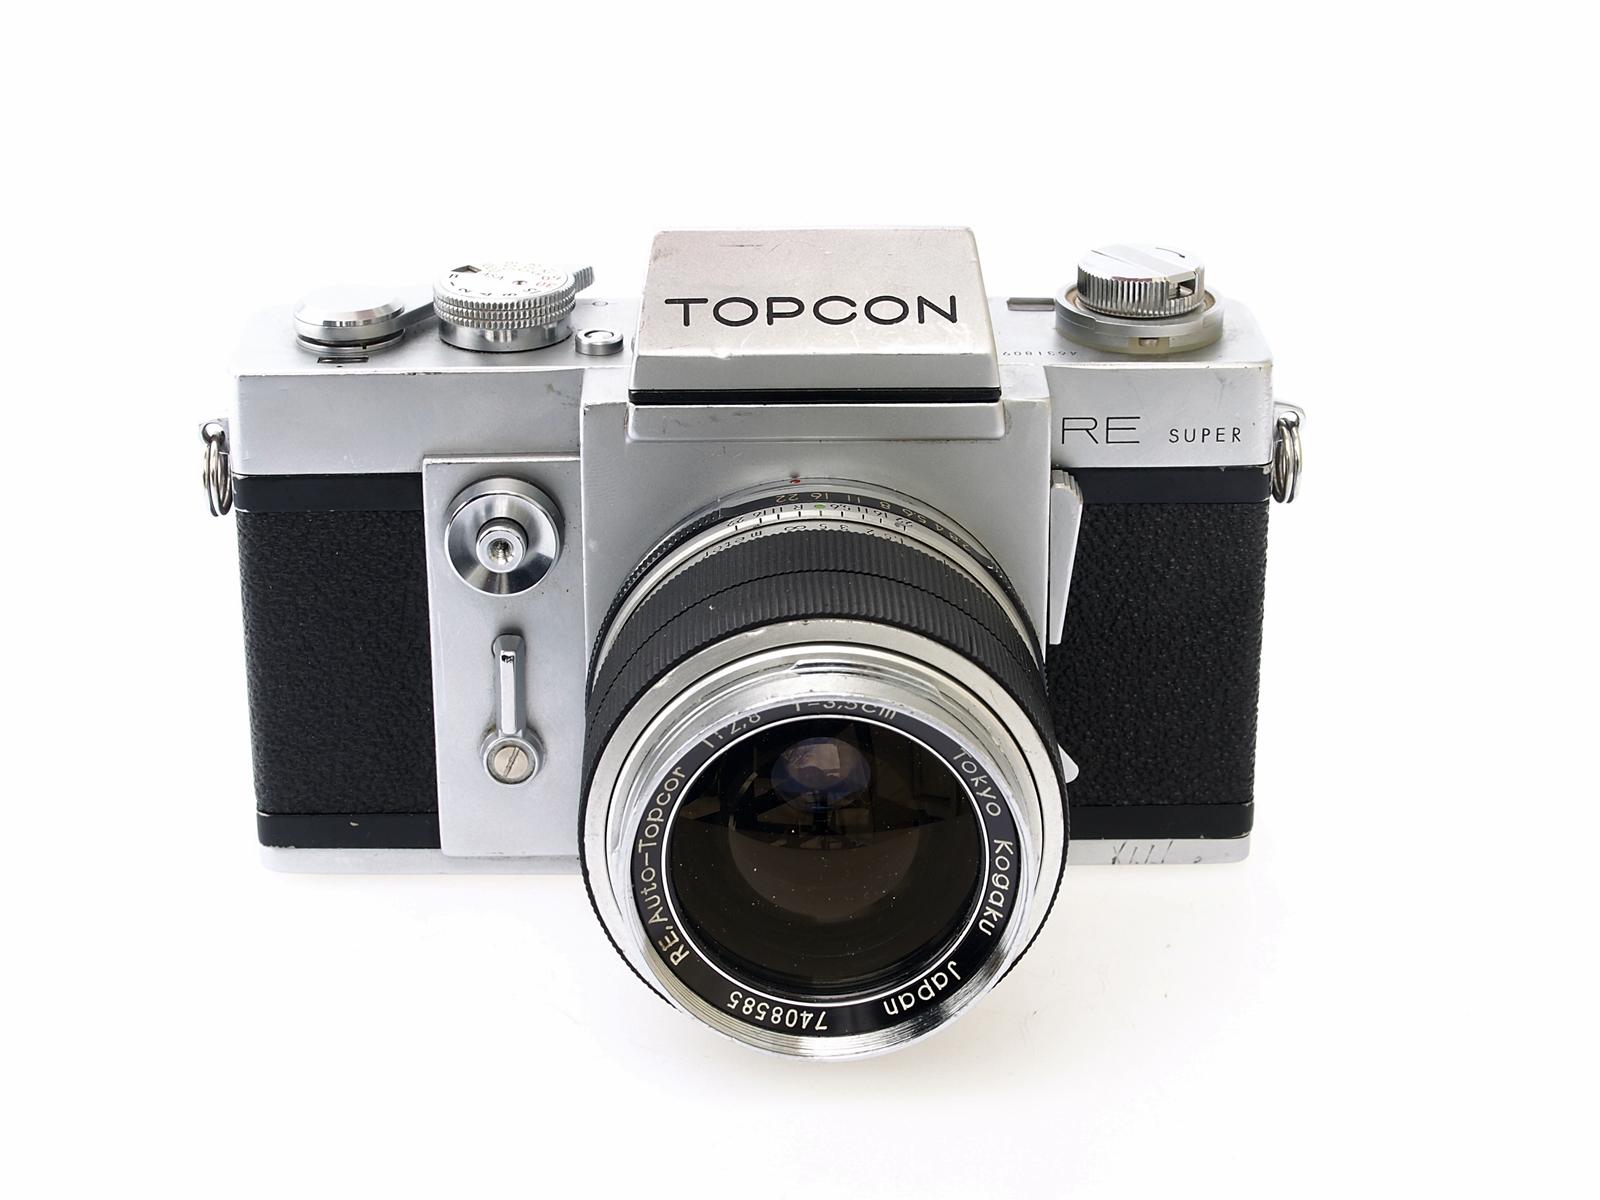 Topcon RE-Super (Japan, 1963-1971)